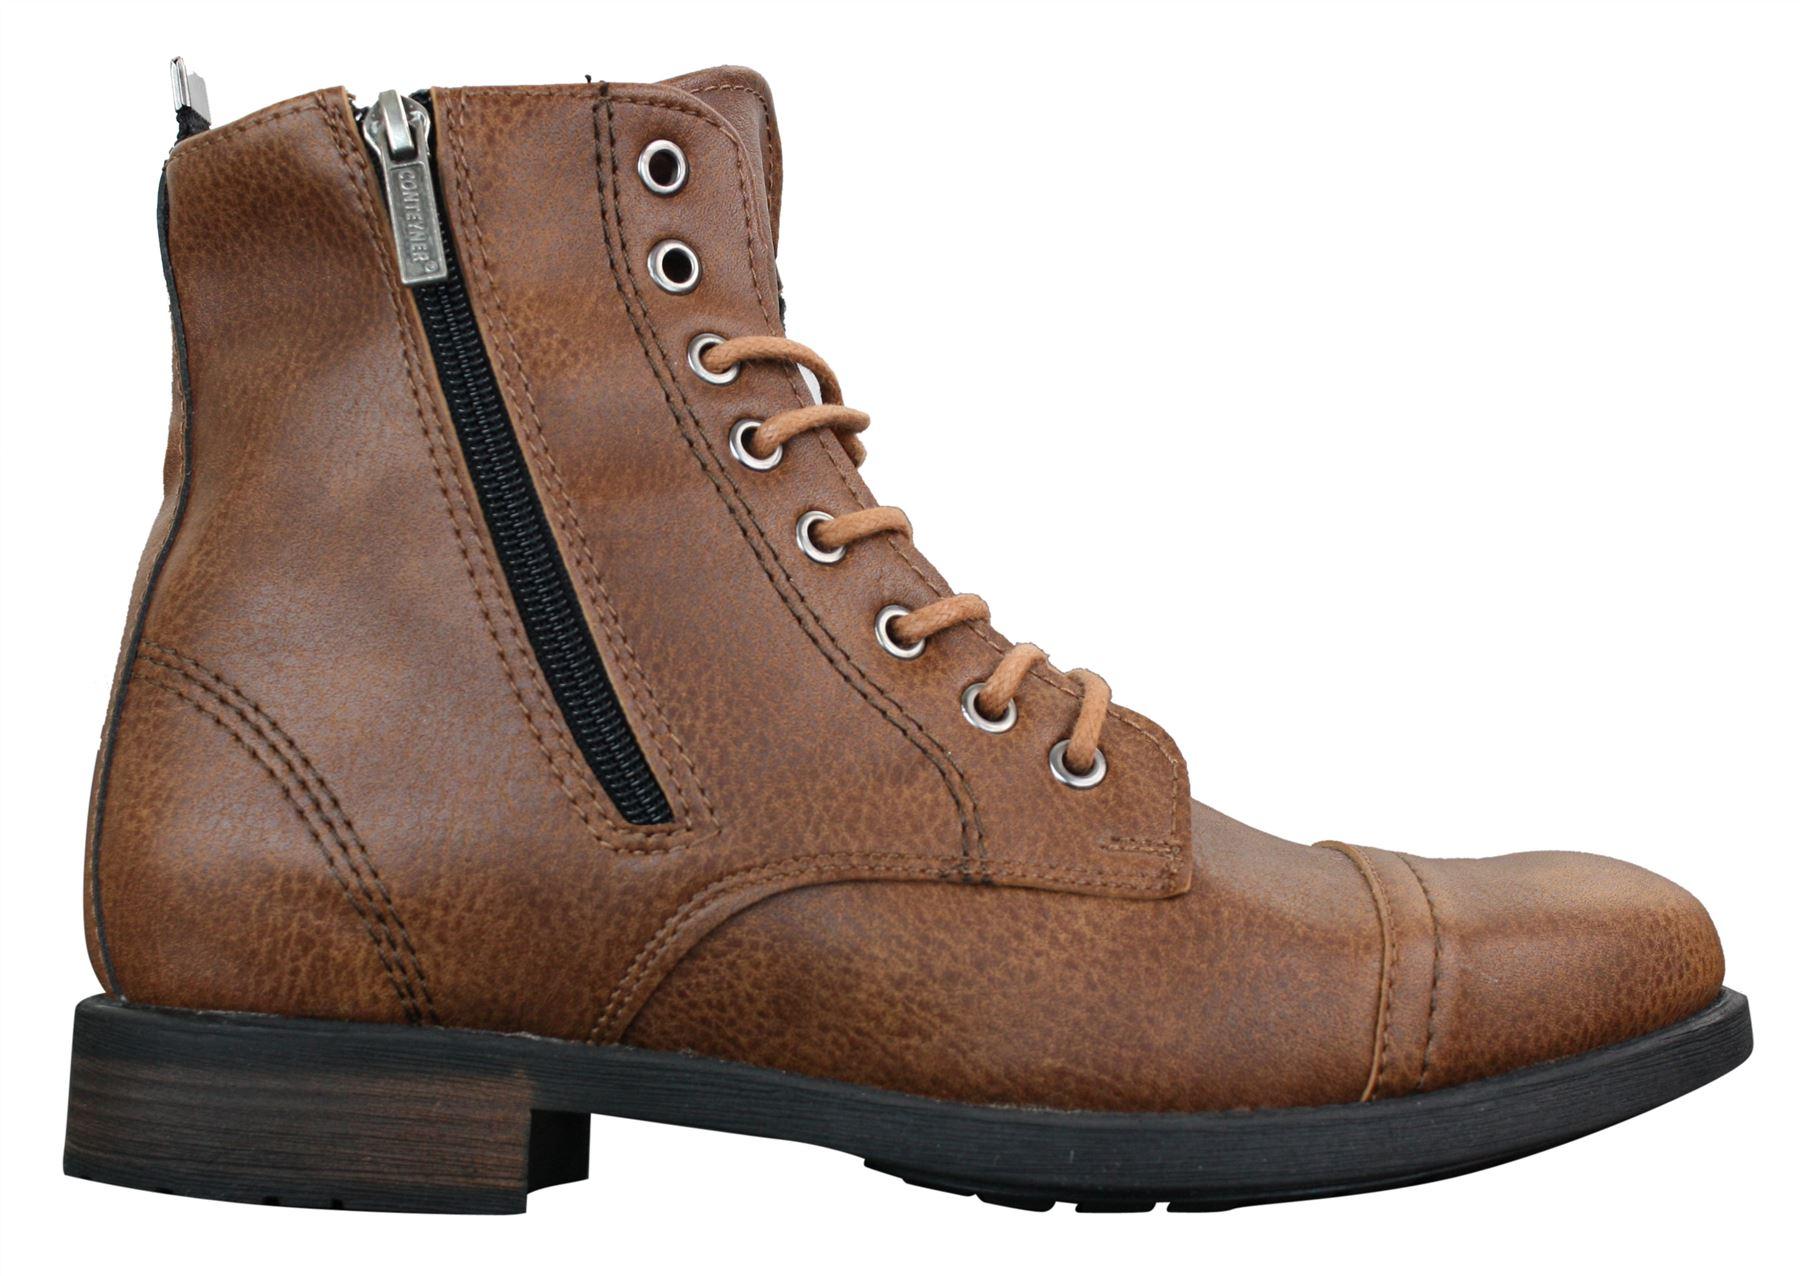 b976533eb470 Mens Smart Casual Laced Zip Military Army Hiking Retro Vintage ...